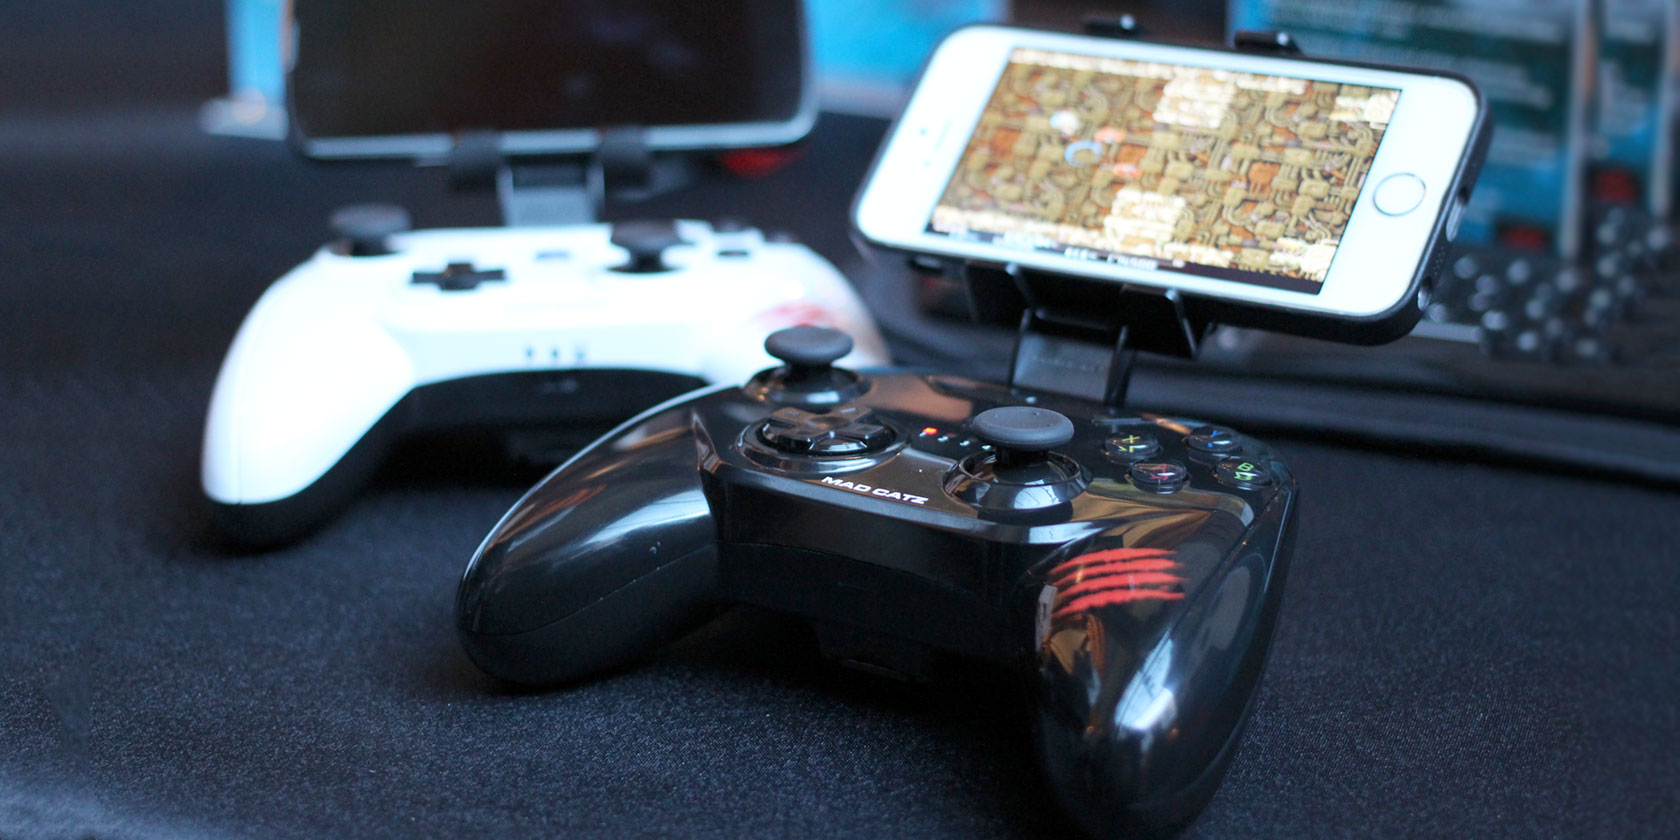 hookup-joystick-iphone